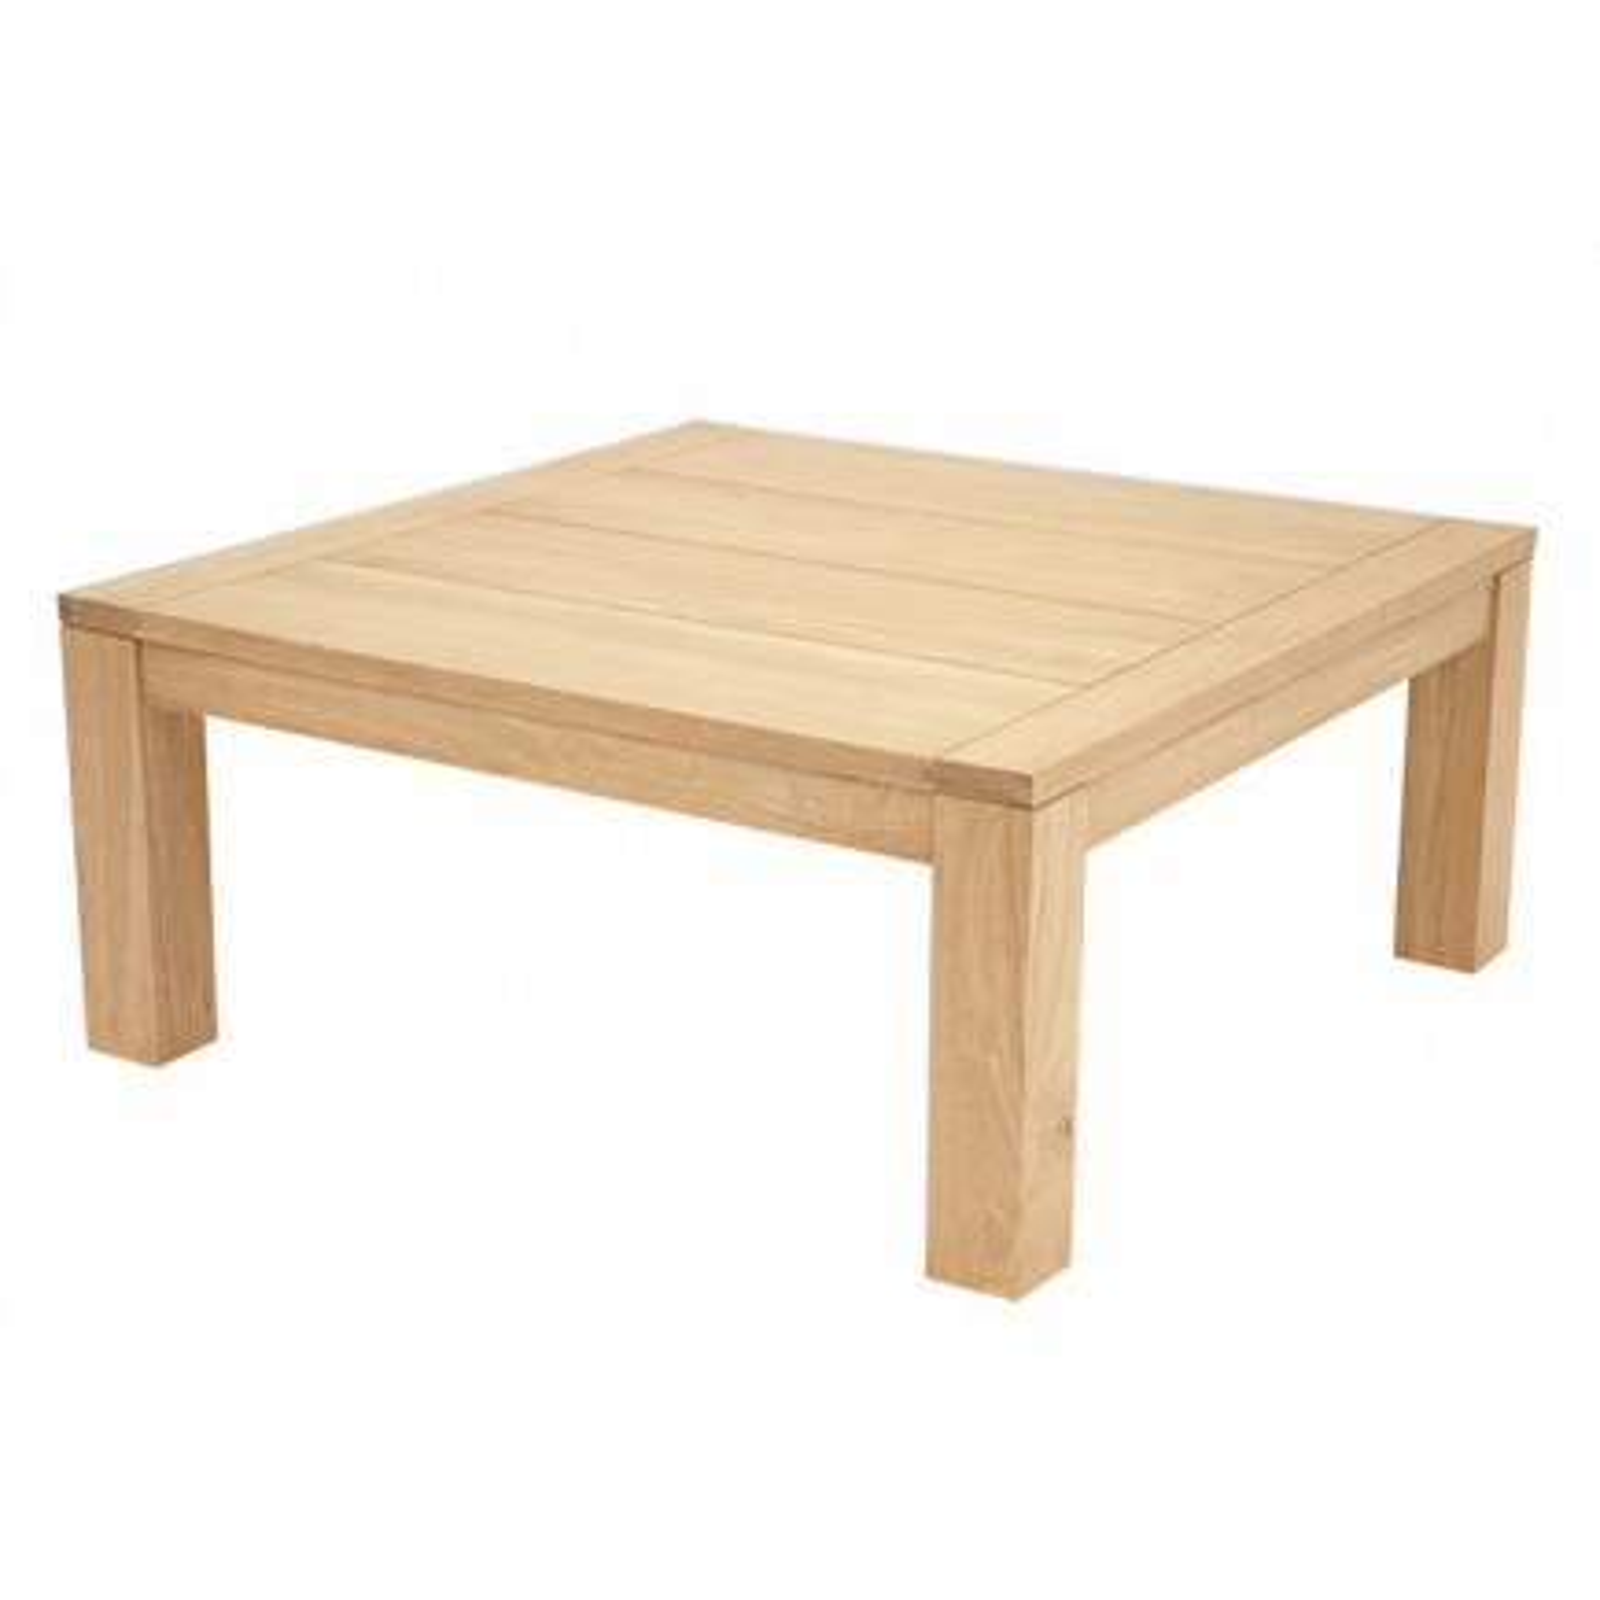 Table Carrée Hévéa Broadway - meuble en bois massif